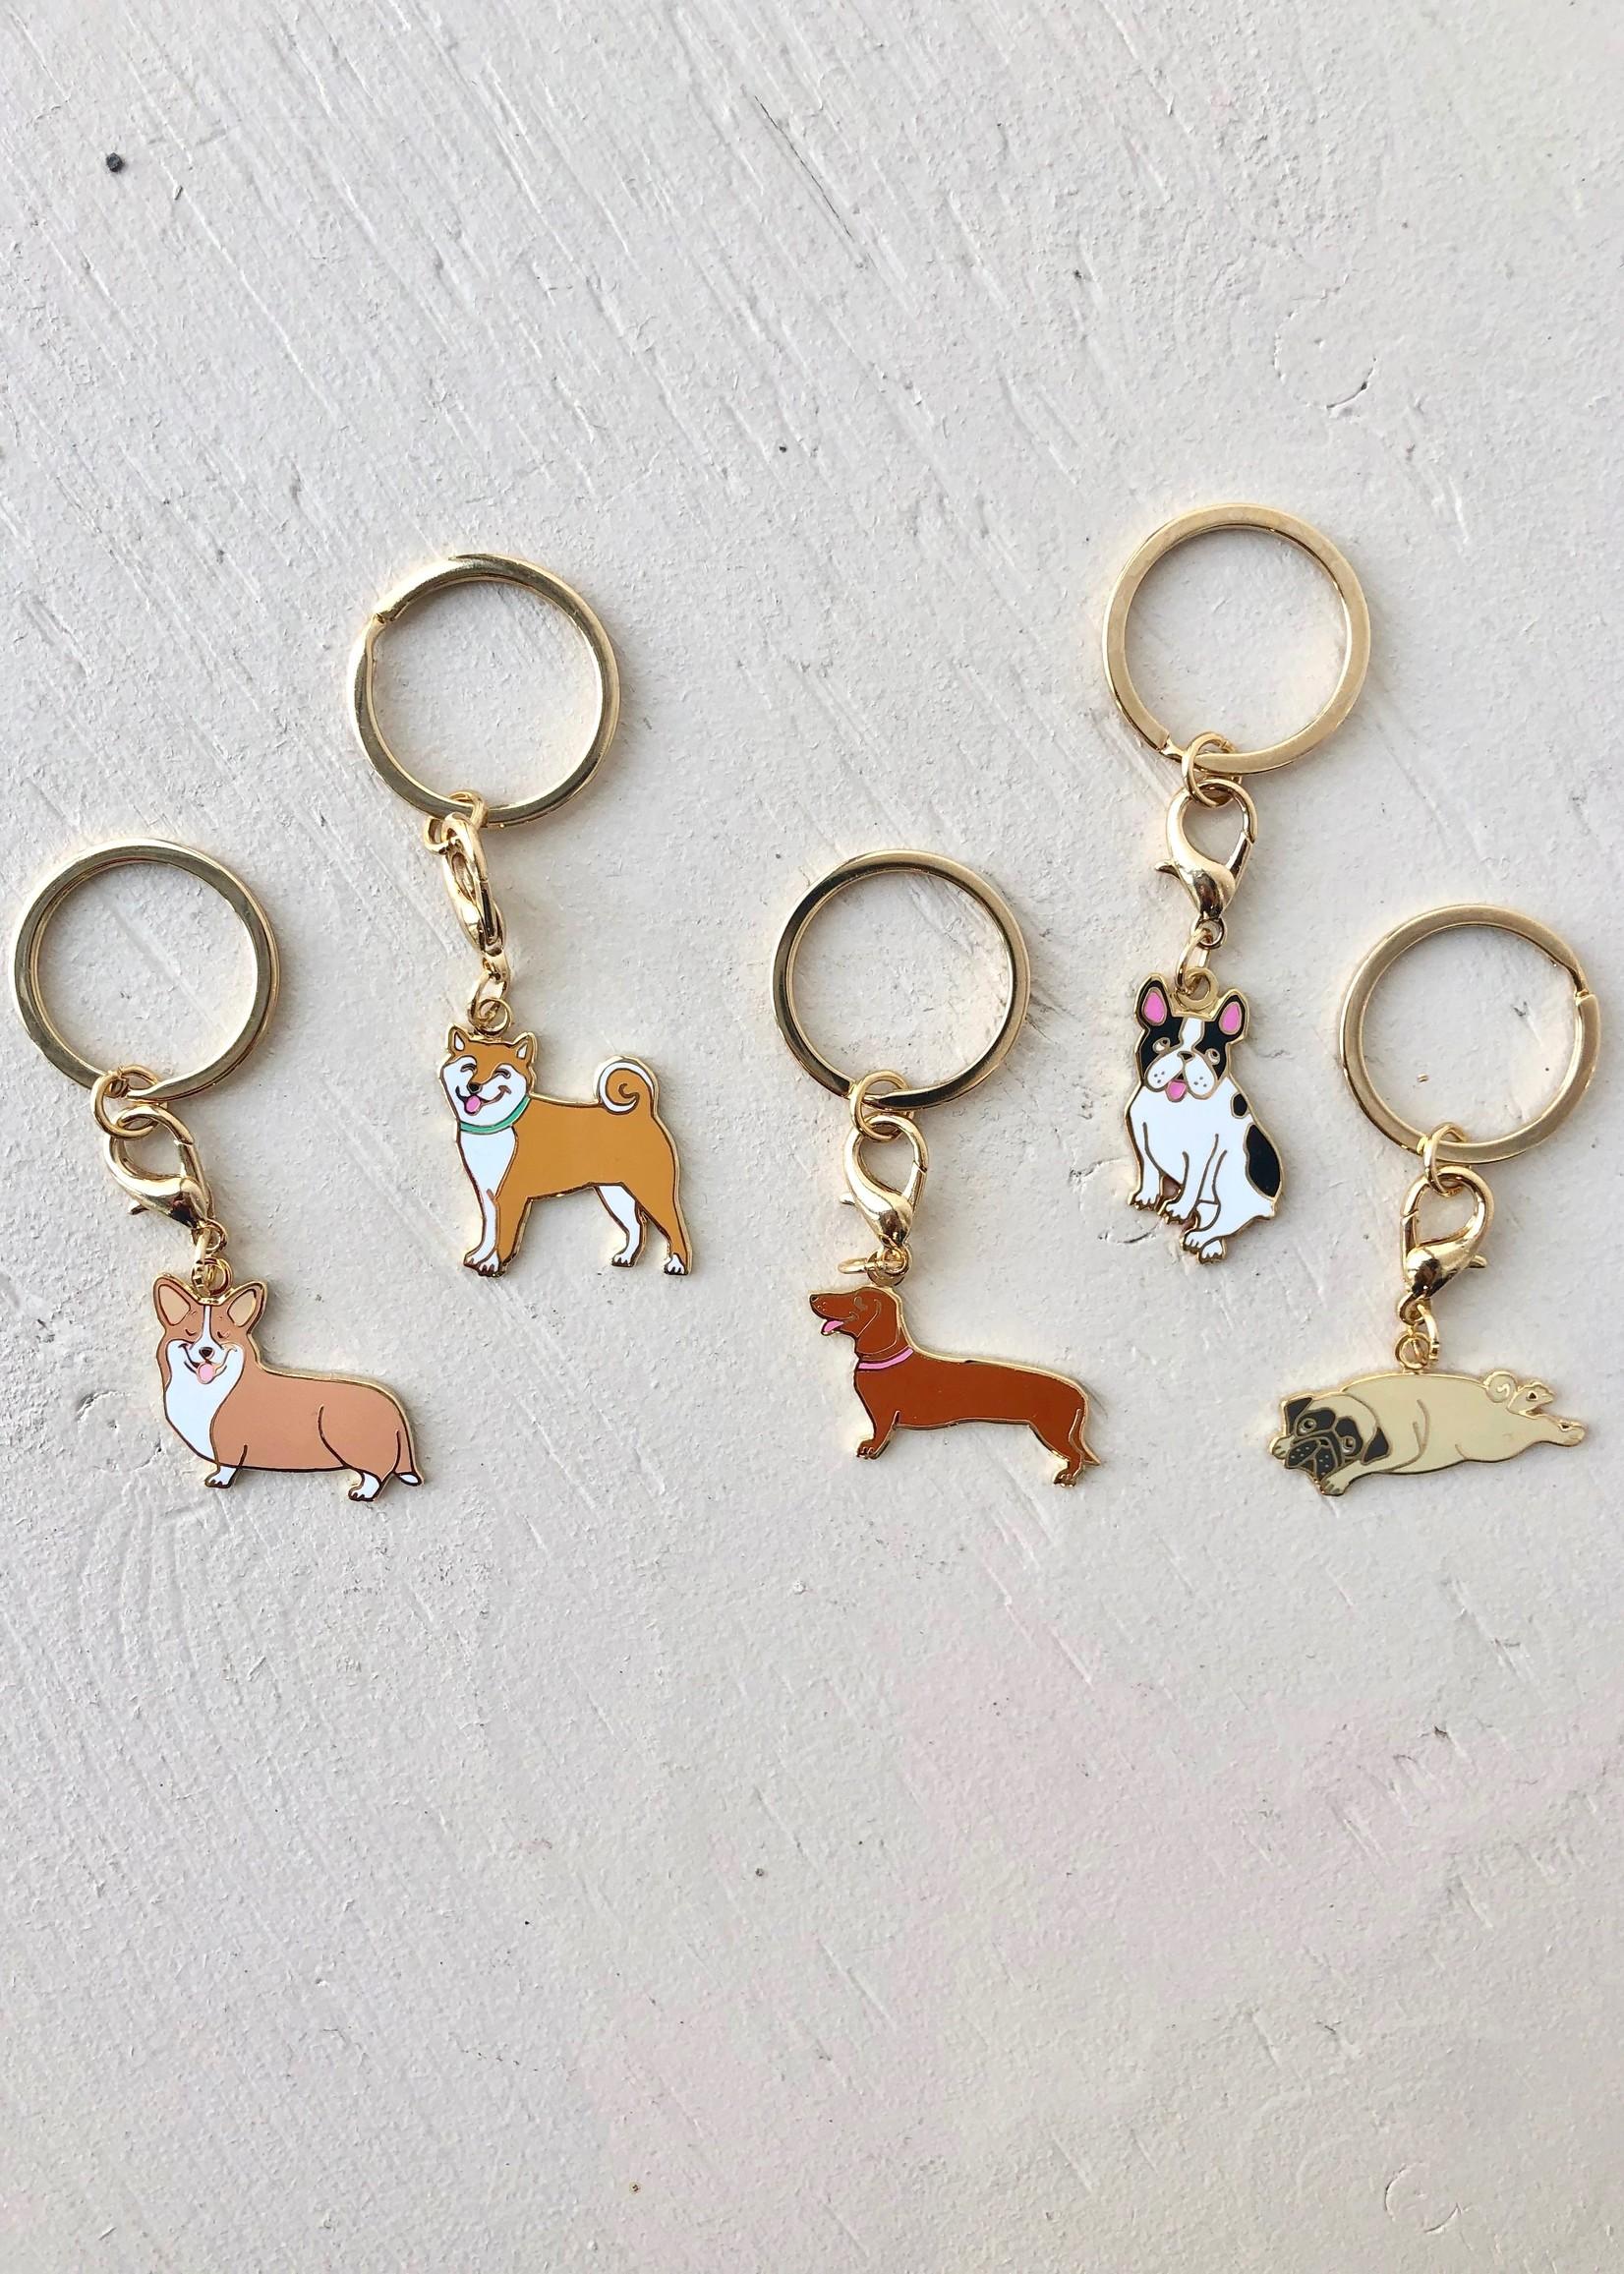 Coucou Suzette Dog Key Chain